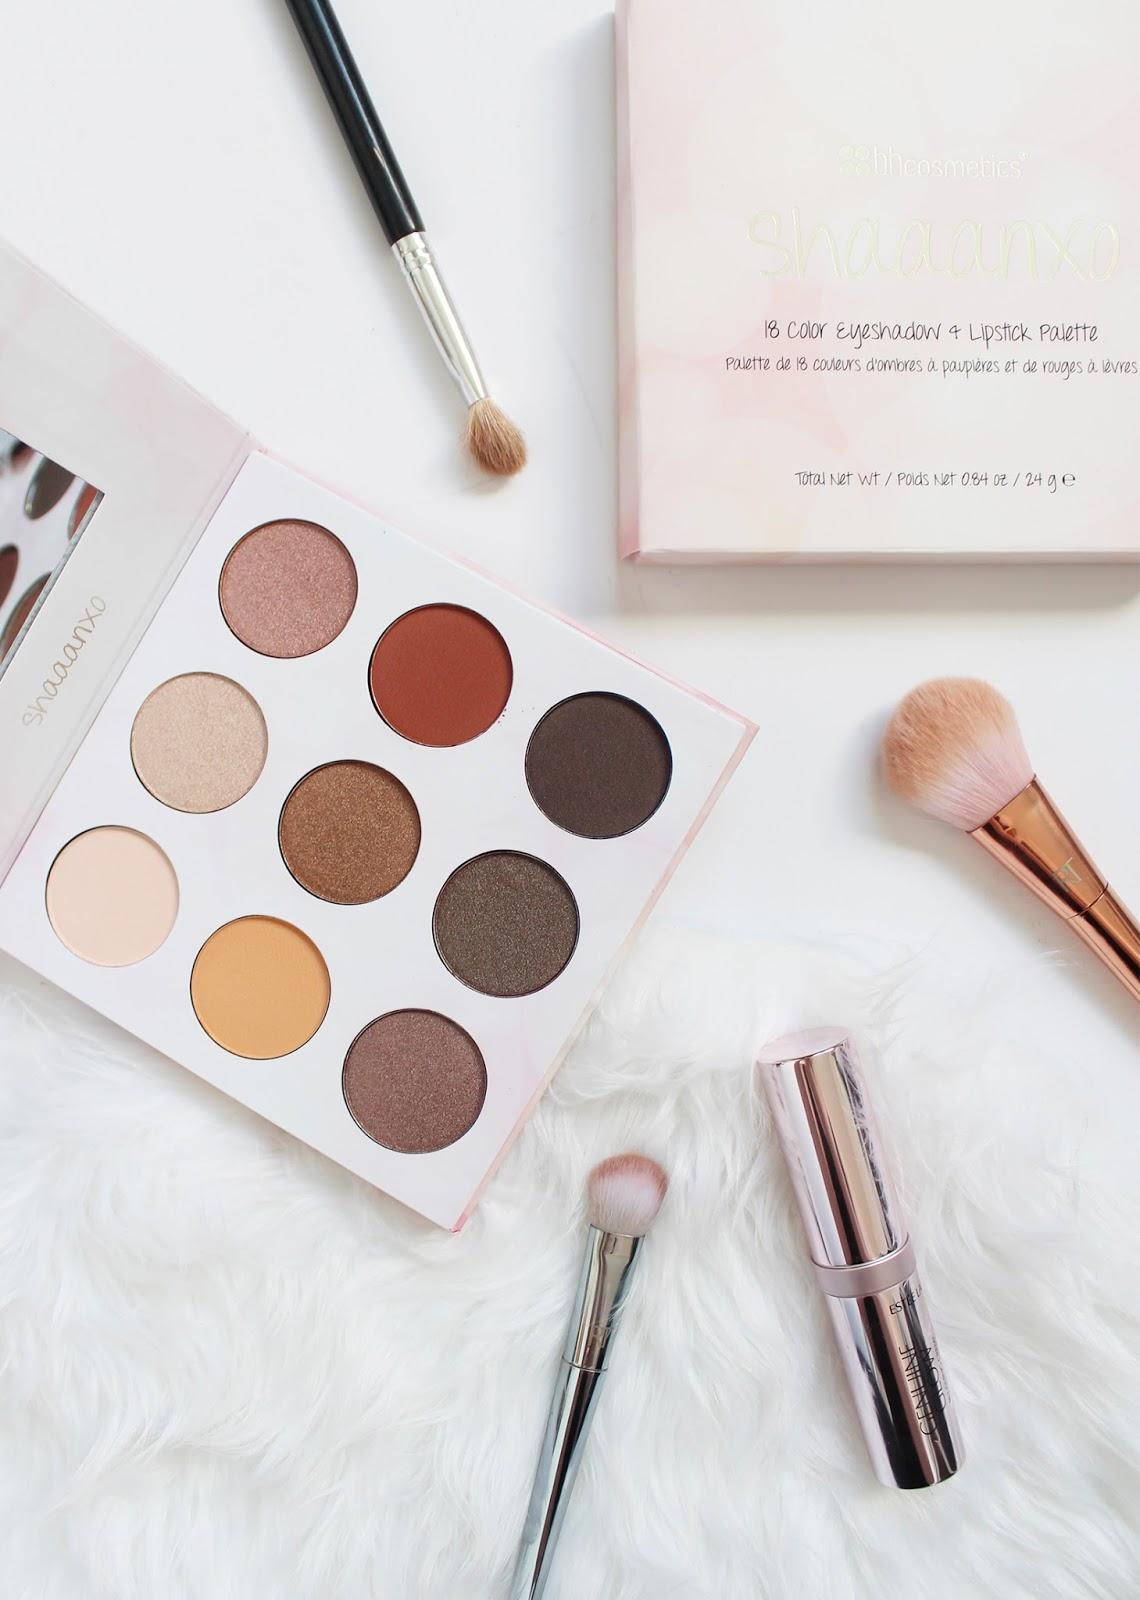 BH COSMETICS | Shaaanxo 18 Color Eyeshadow + Lipstick Palette - Review + Swatches - CassandraMyee